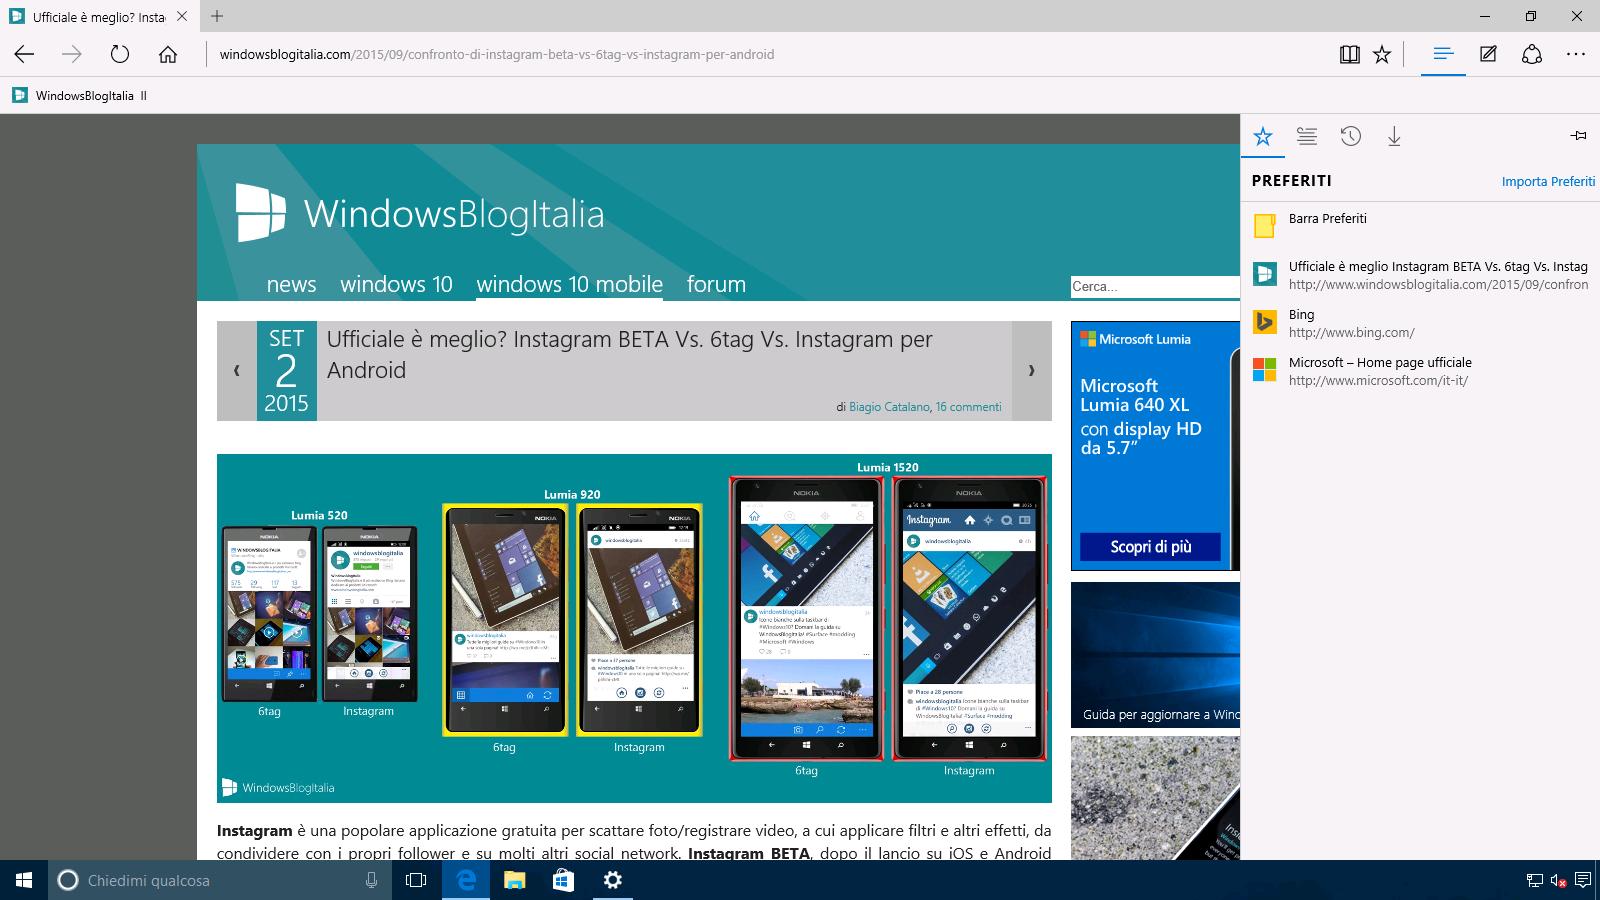 MicrosoftEdge-9